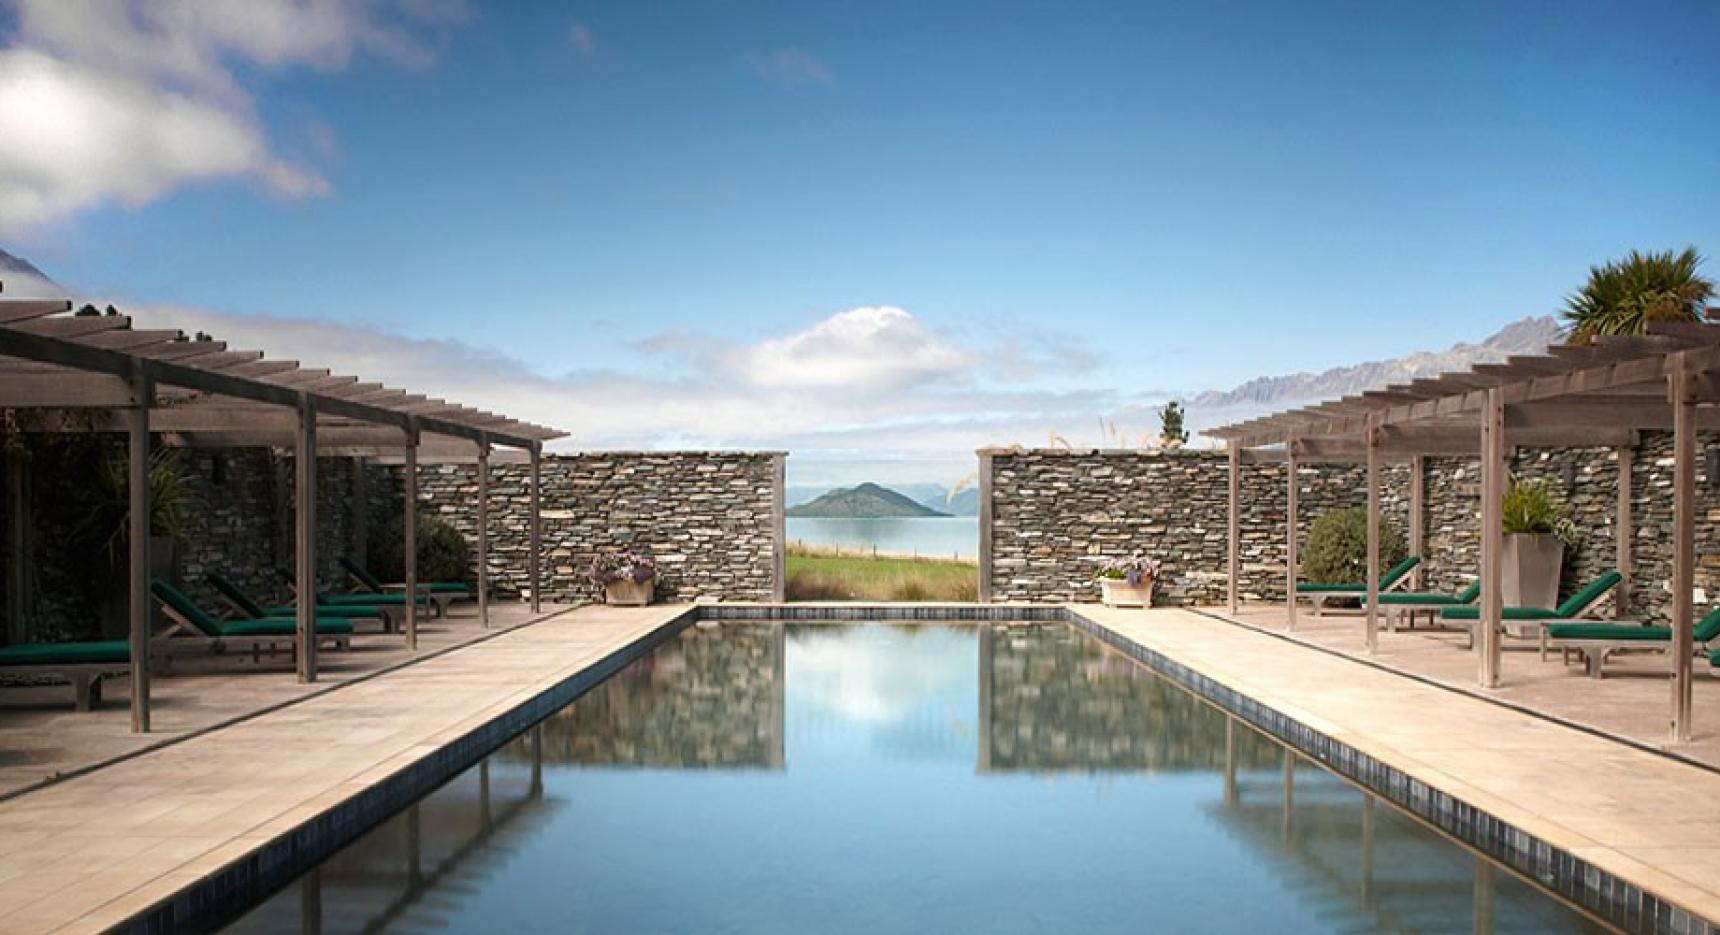 Vista da piscina do hotel Blanket Bay, Queenstown, Nova Zelândia